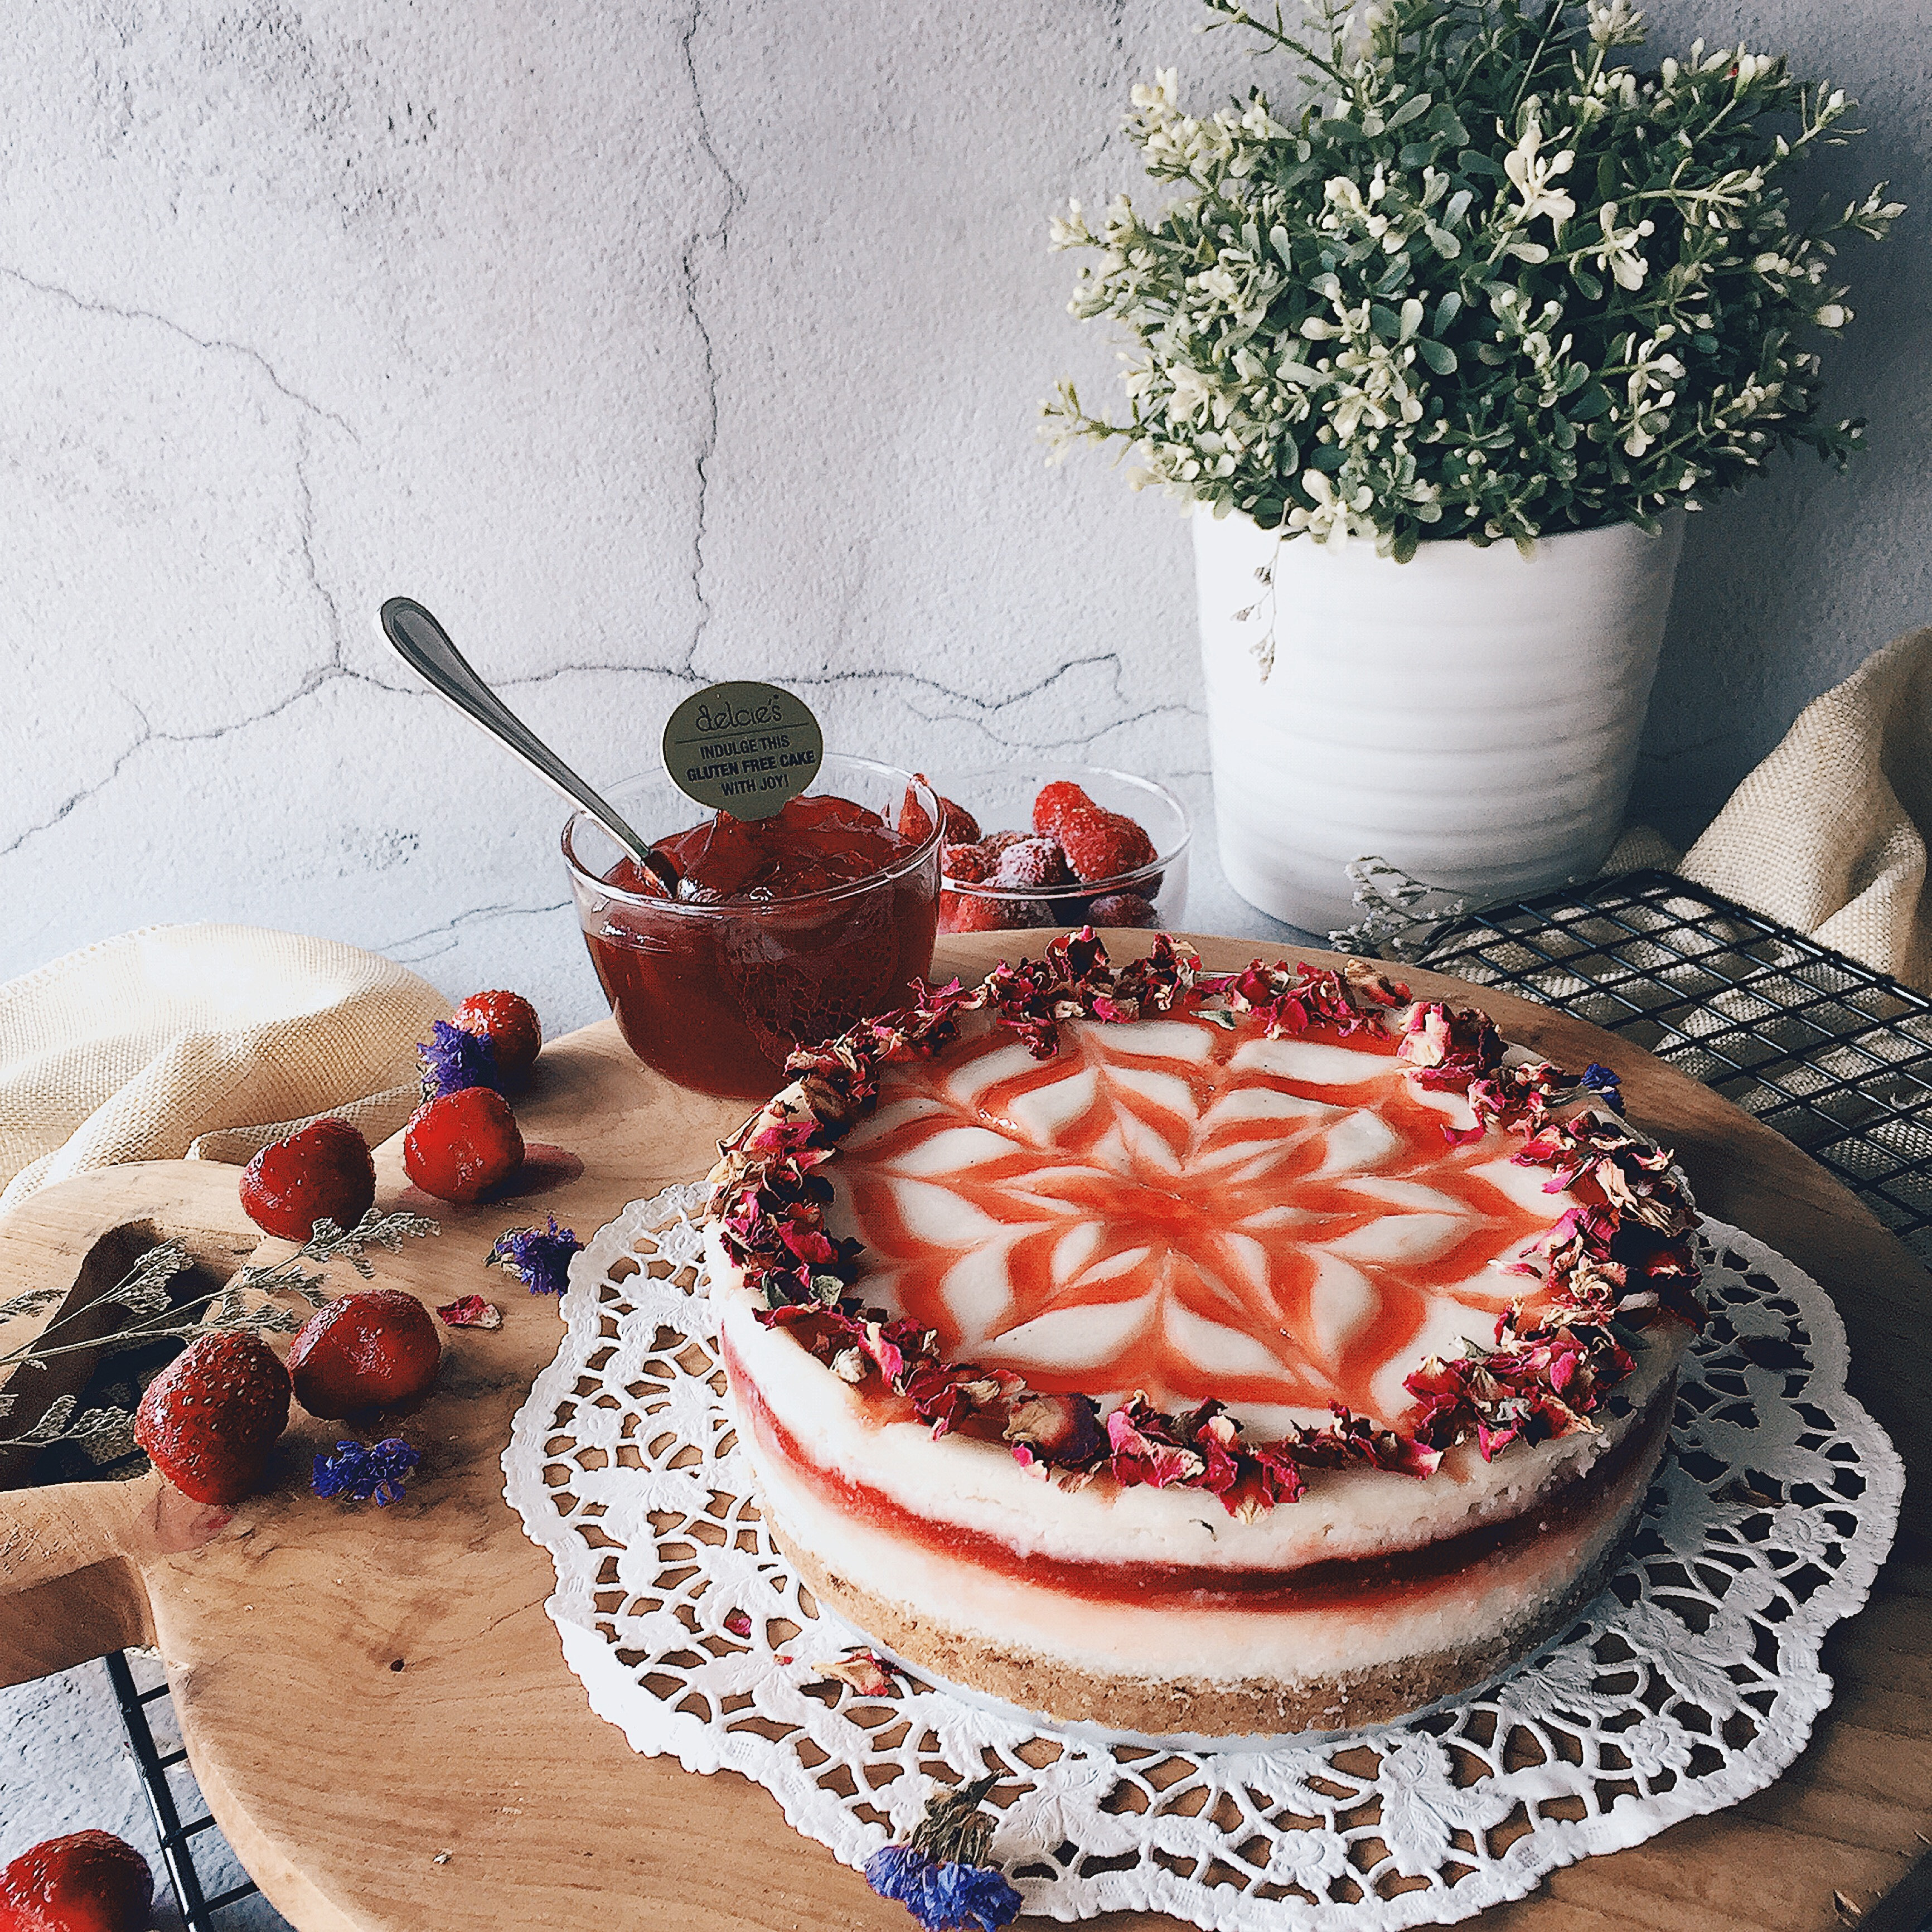 Gluten Free Diabetic Desserts  Strawberry Cheesecake Vegan Diabetic Friendly Gluten